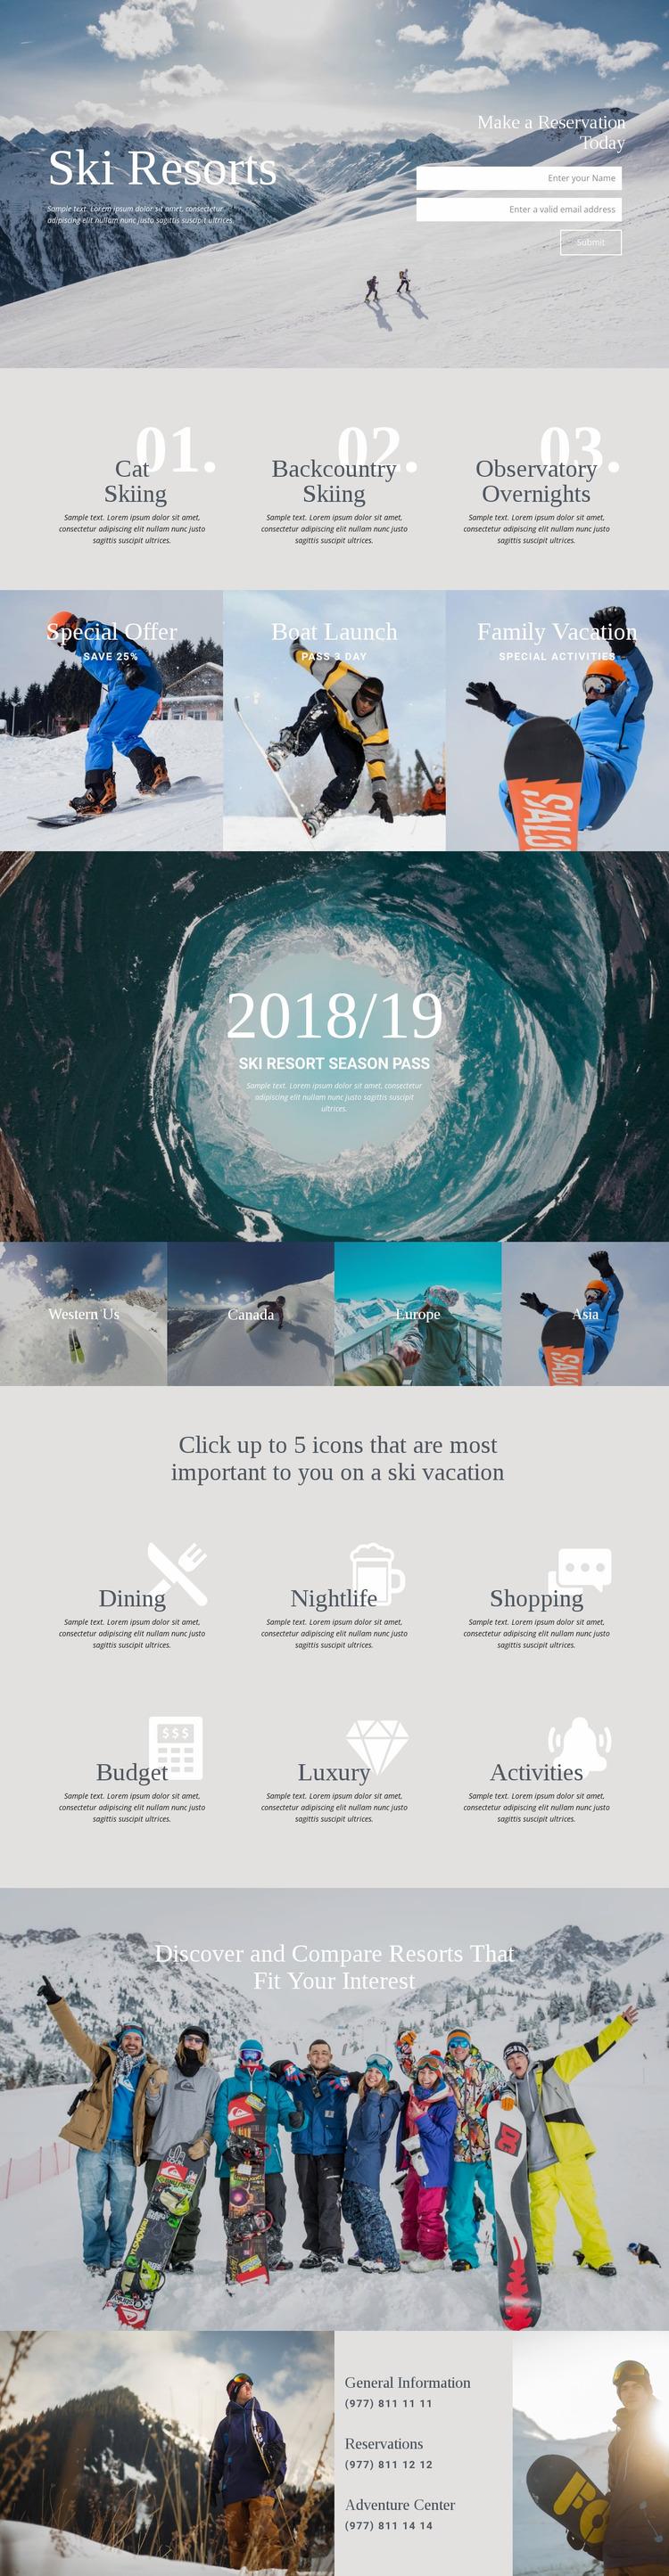 Ski Resorts Website Mockup